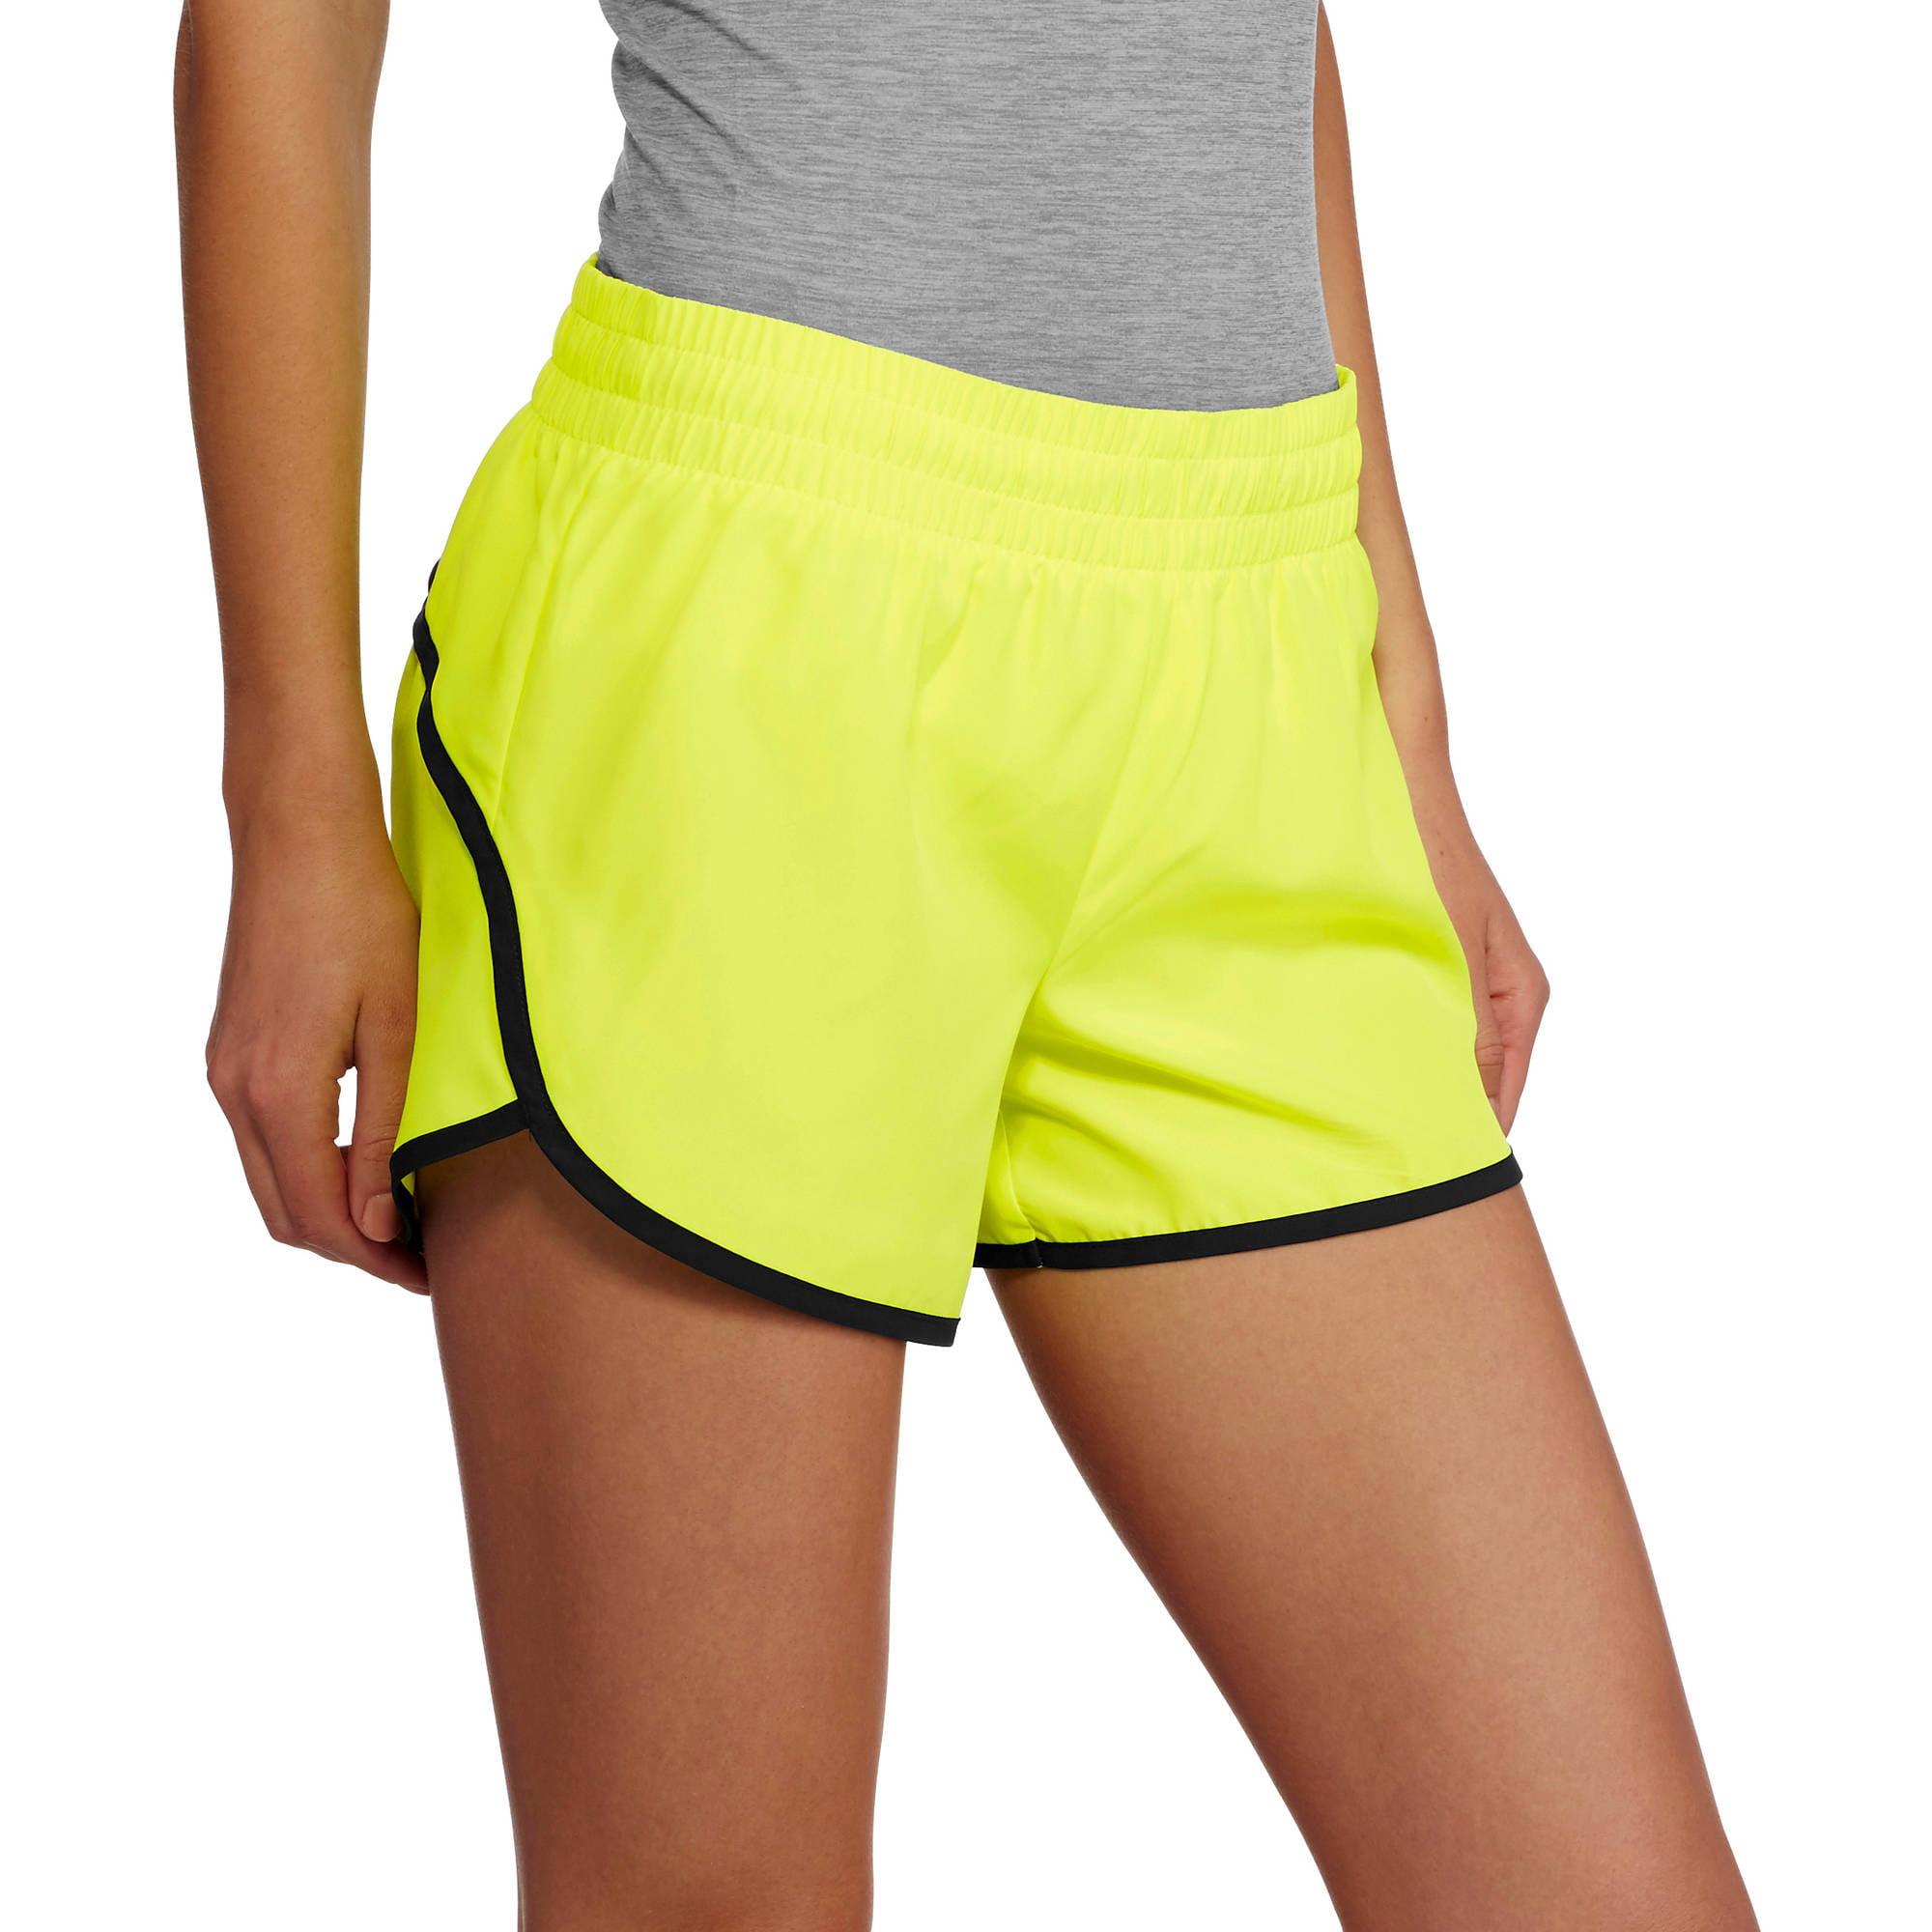 Danskin Now Women's Woven Running Shorts With Built-In Liner